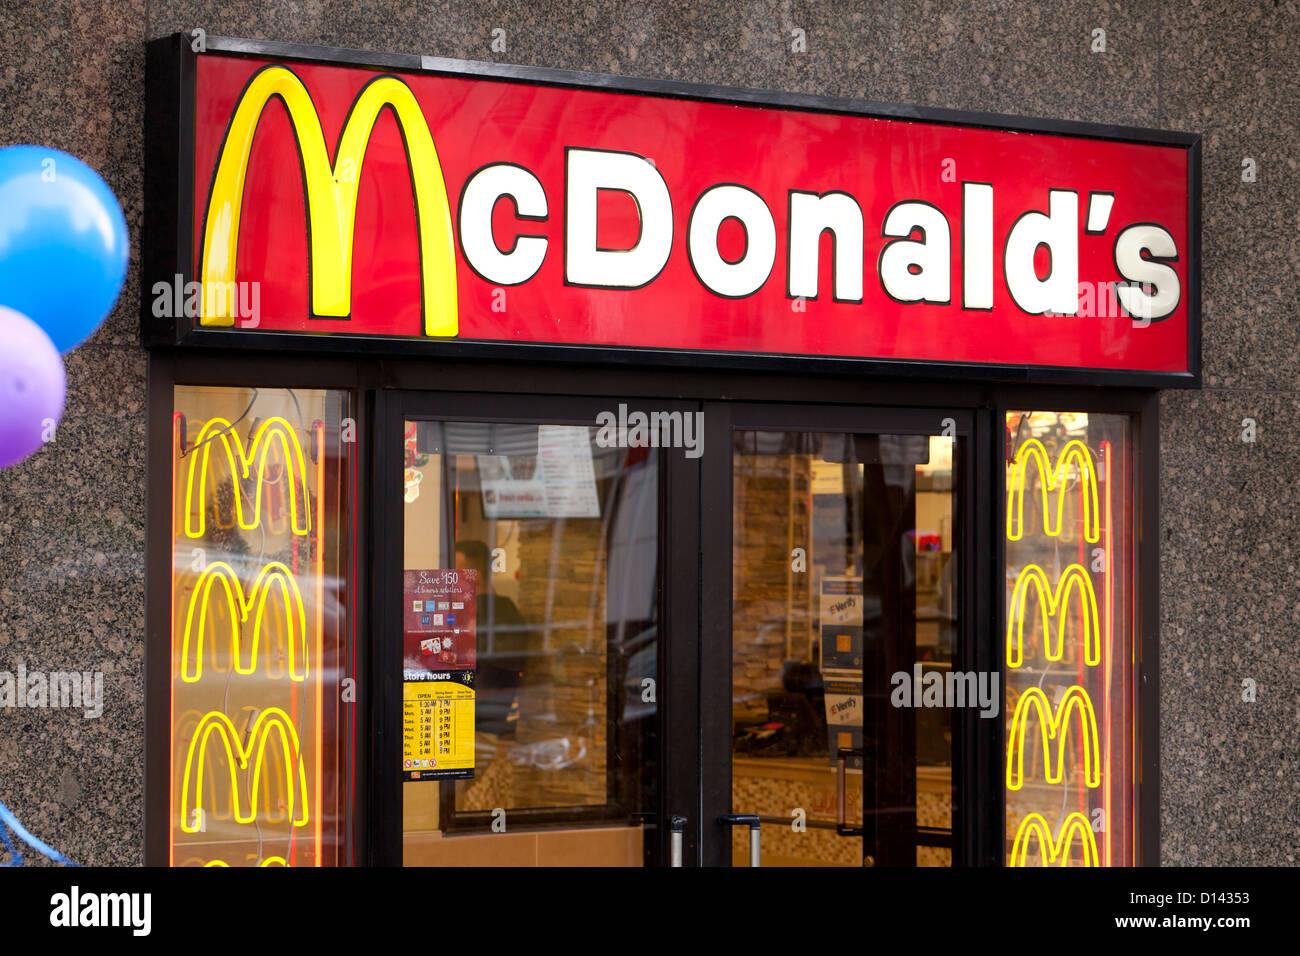 McDonald's entrance - Stock Image